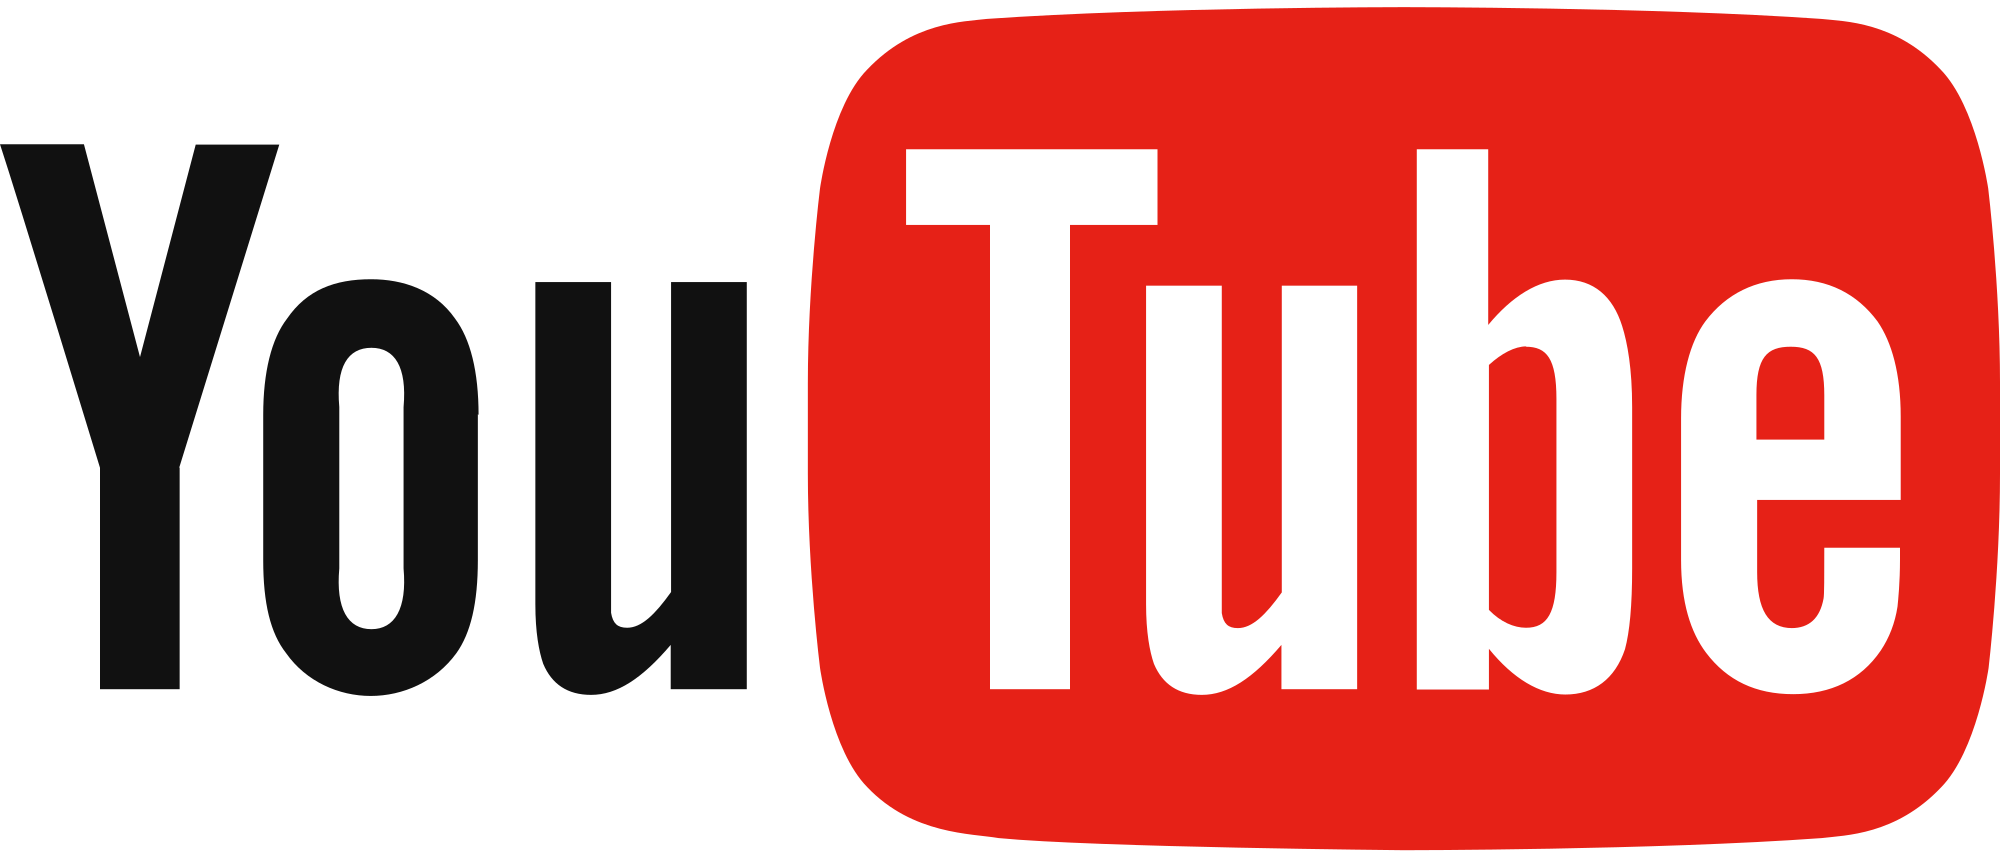 Youtube clipart maker, Youtube maker Transparent FREE for.